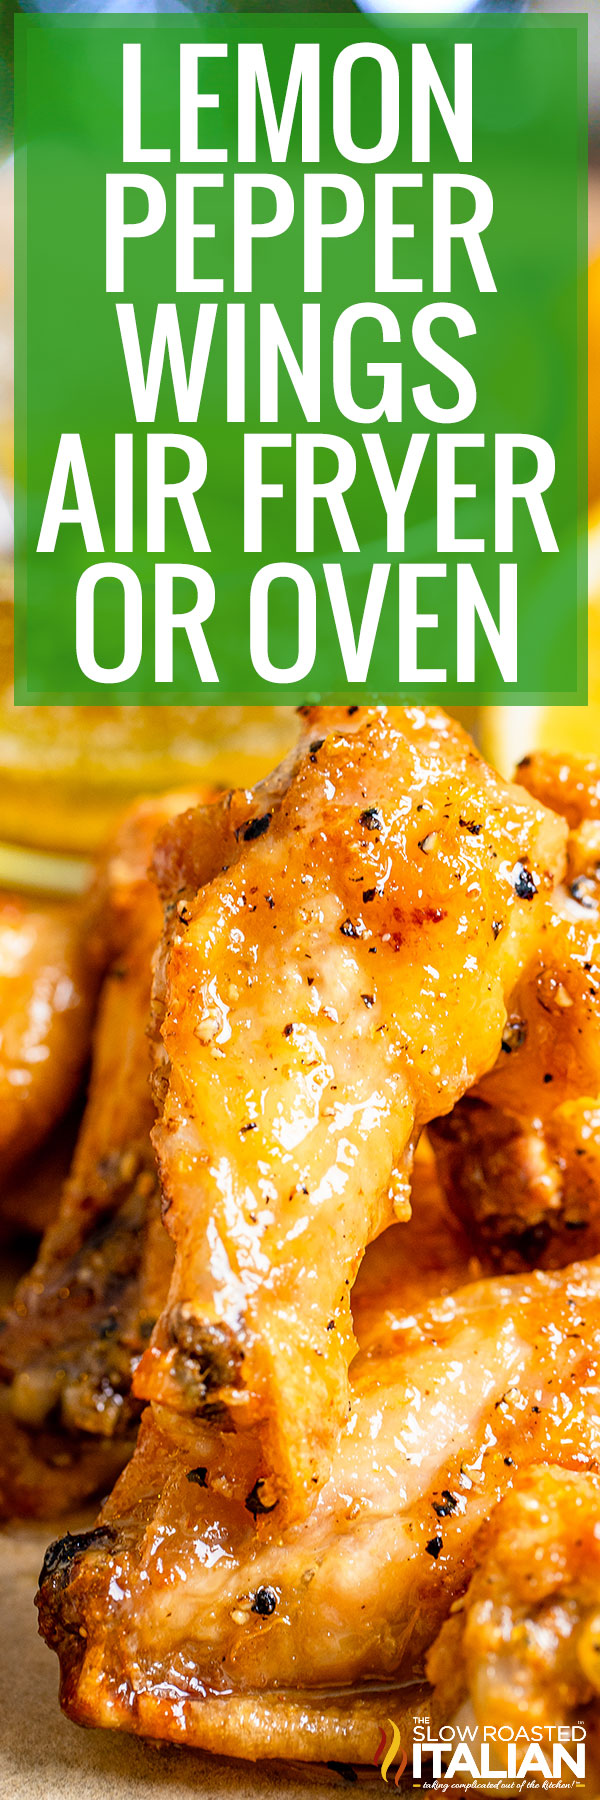 Lemon Pepper Wings (Air Fryer or Oven)